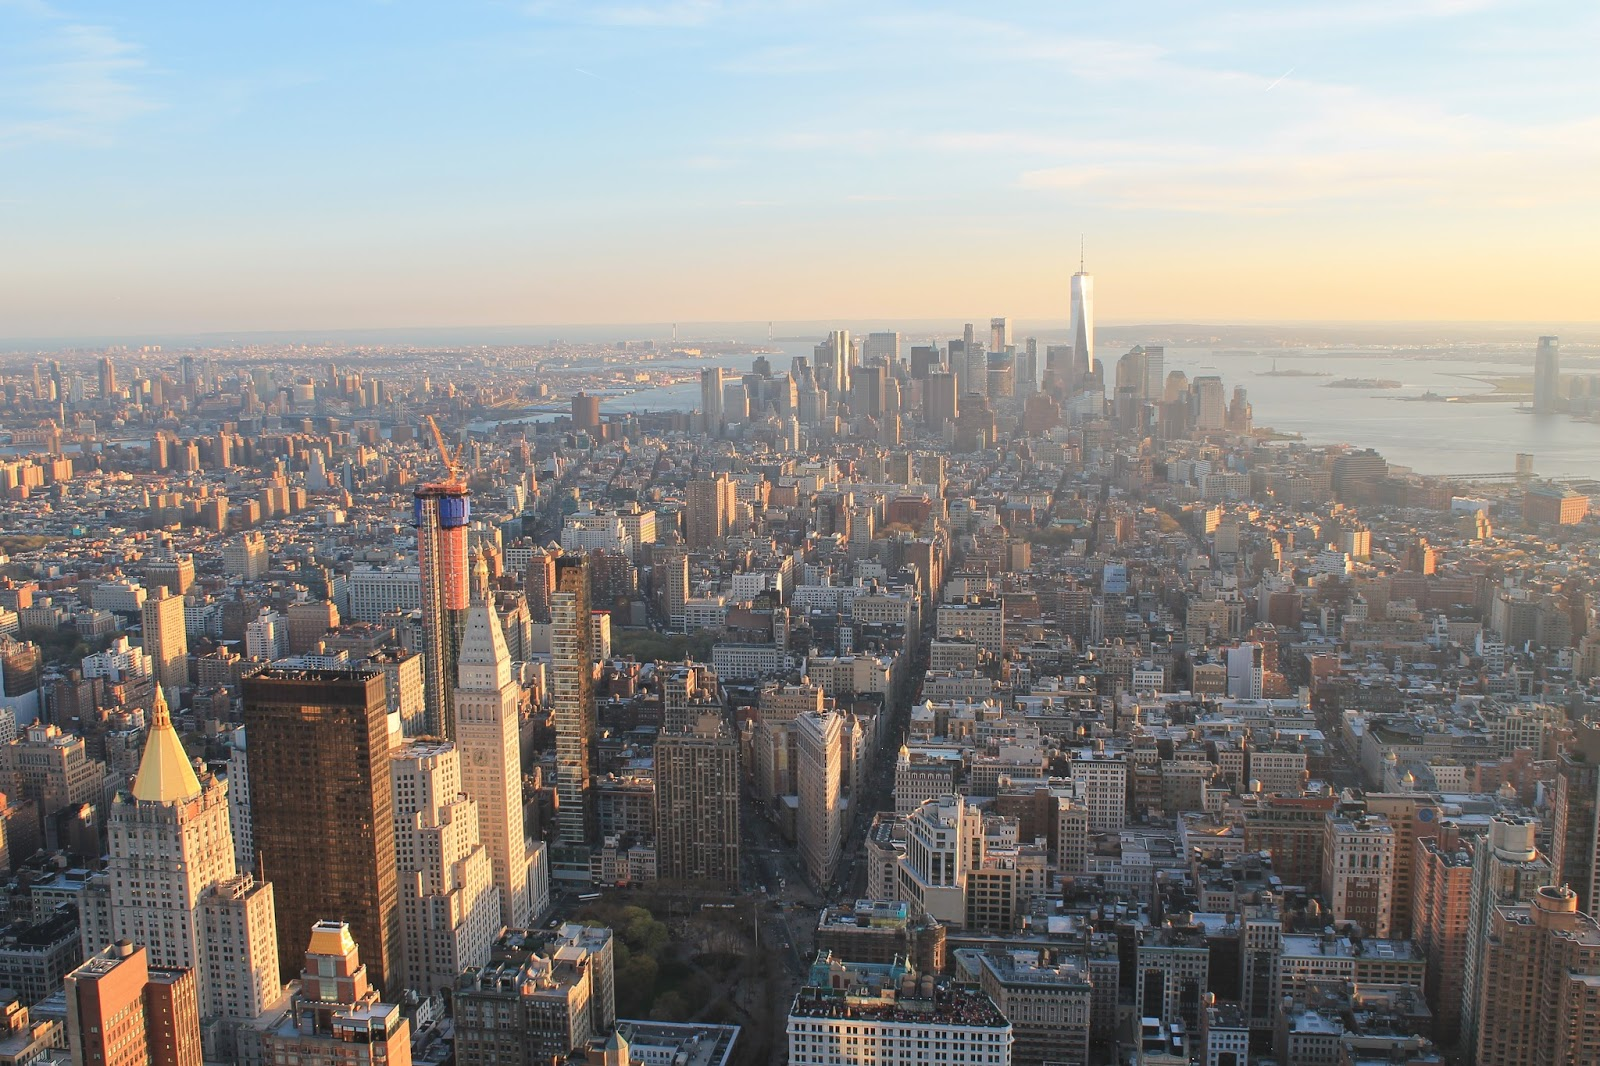 usa, nyc, new york, city, empire state building, top, vue, panorama, panoramique, coucher de soleil, sunshine, soleil, voyage, trip2live, road trip, holidays, airbnb, ceetiz